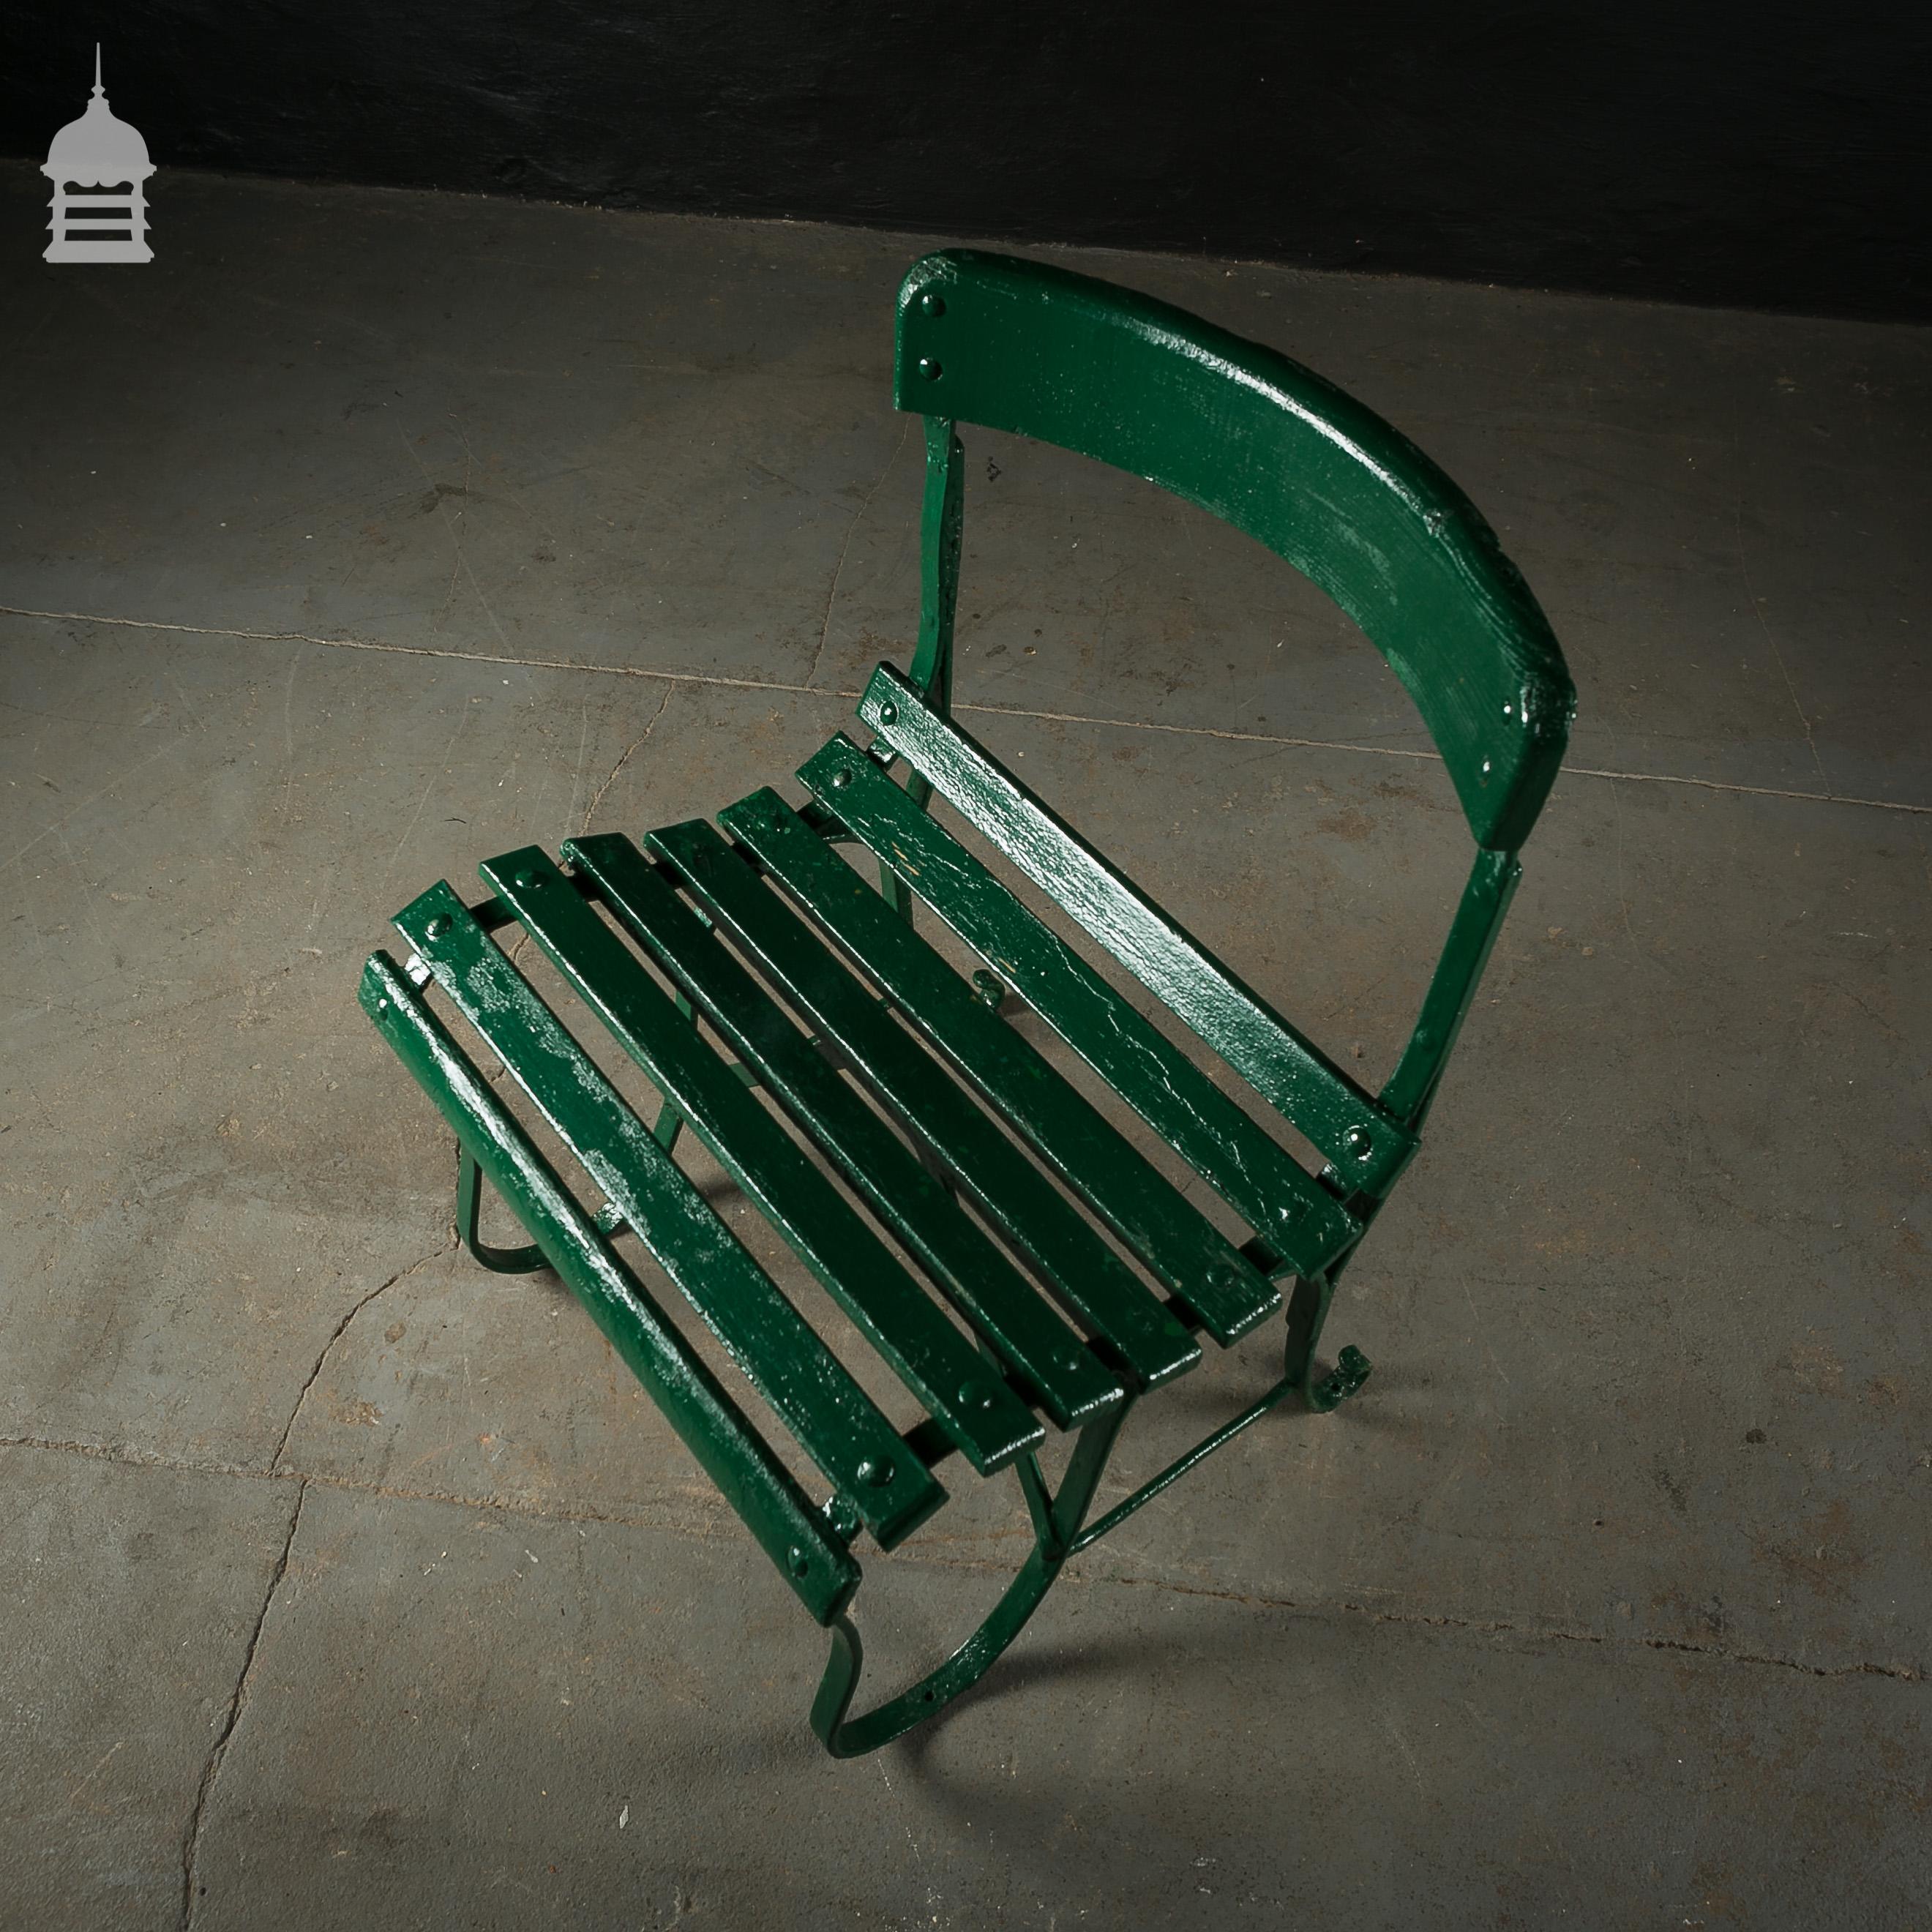 4 Wrought Iron Garden Chairs with Hardwood Slats 5